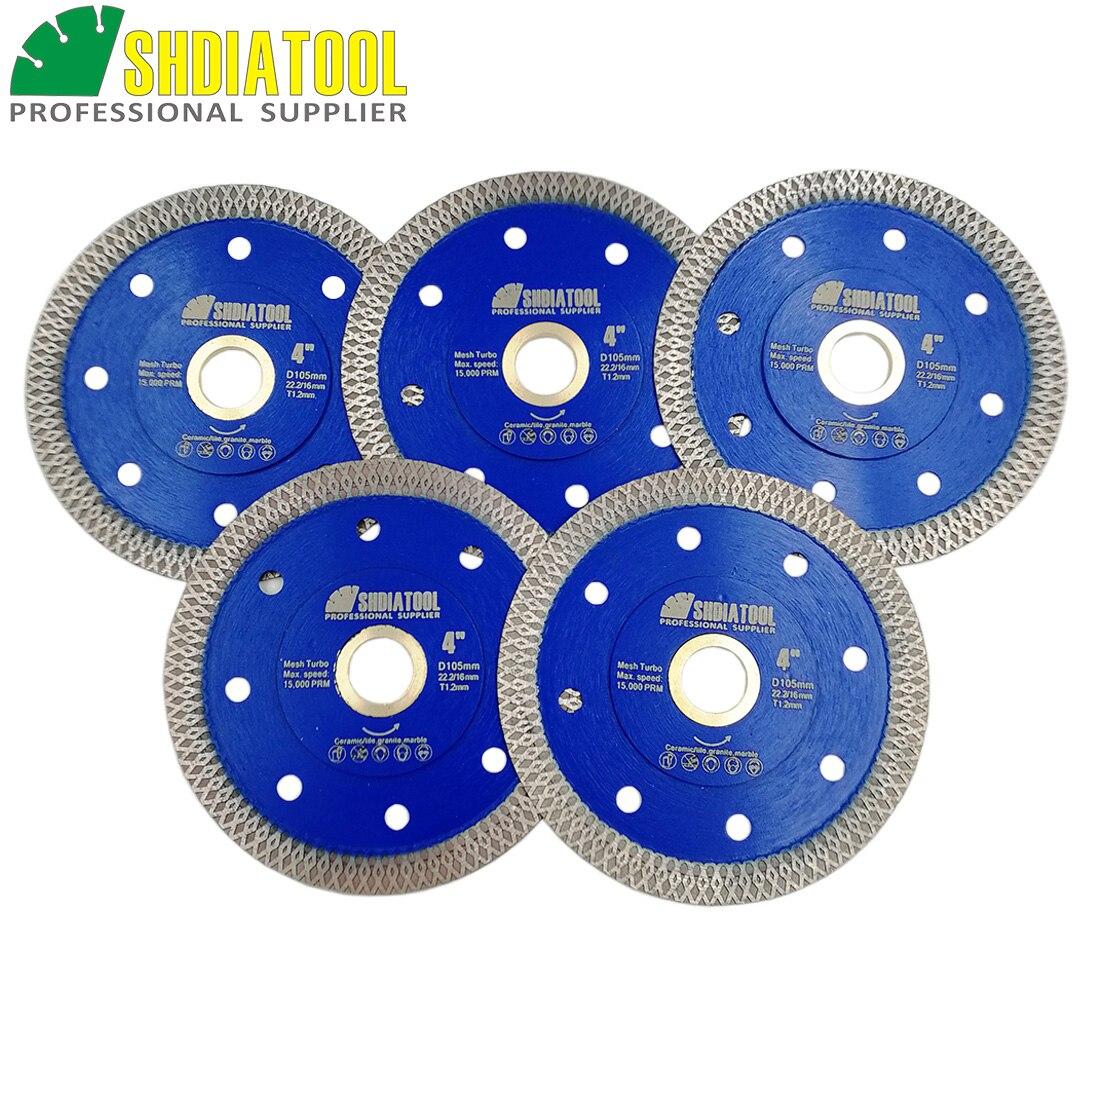 SHDIATOOL 5pcs Diamond Sintered Cutting Disc X Mesh Turbo Saw Blade Dia 4 105mm 4 5